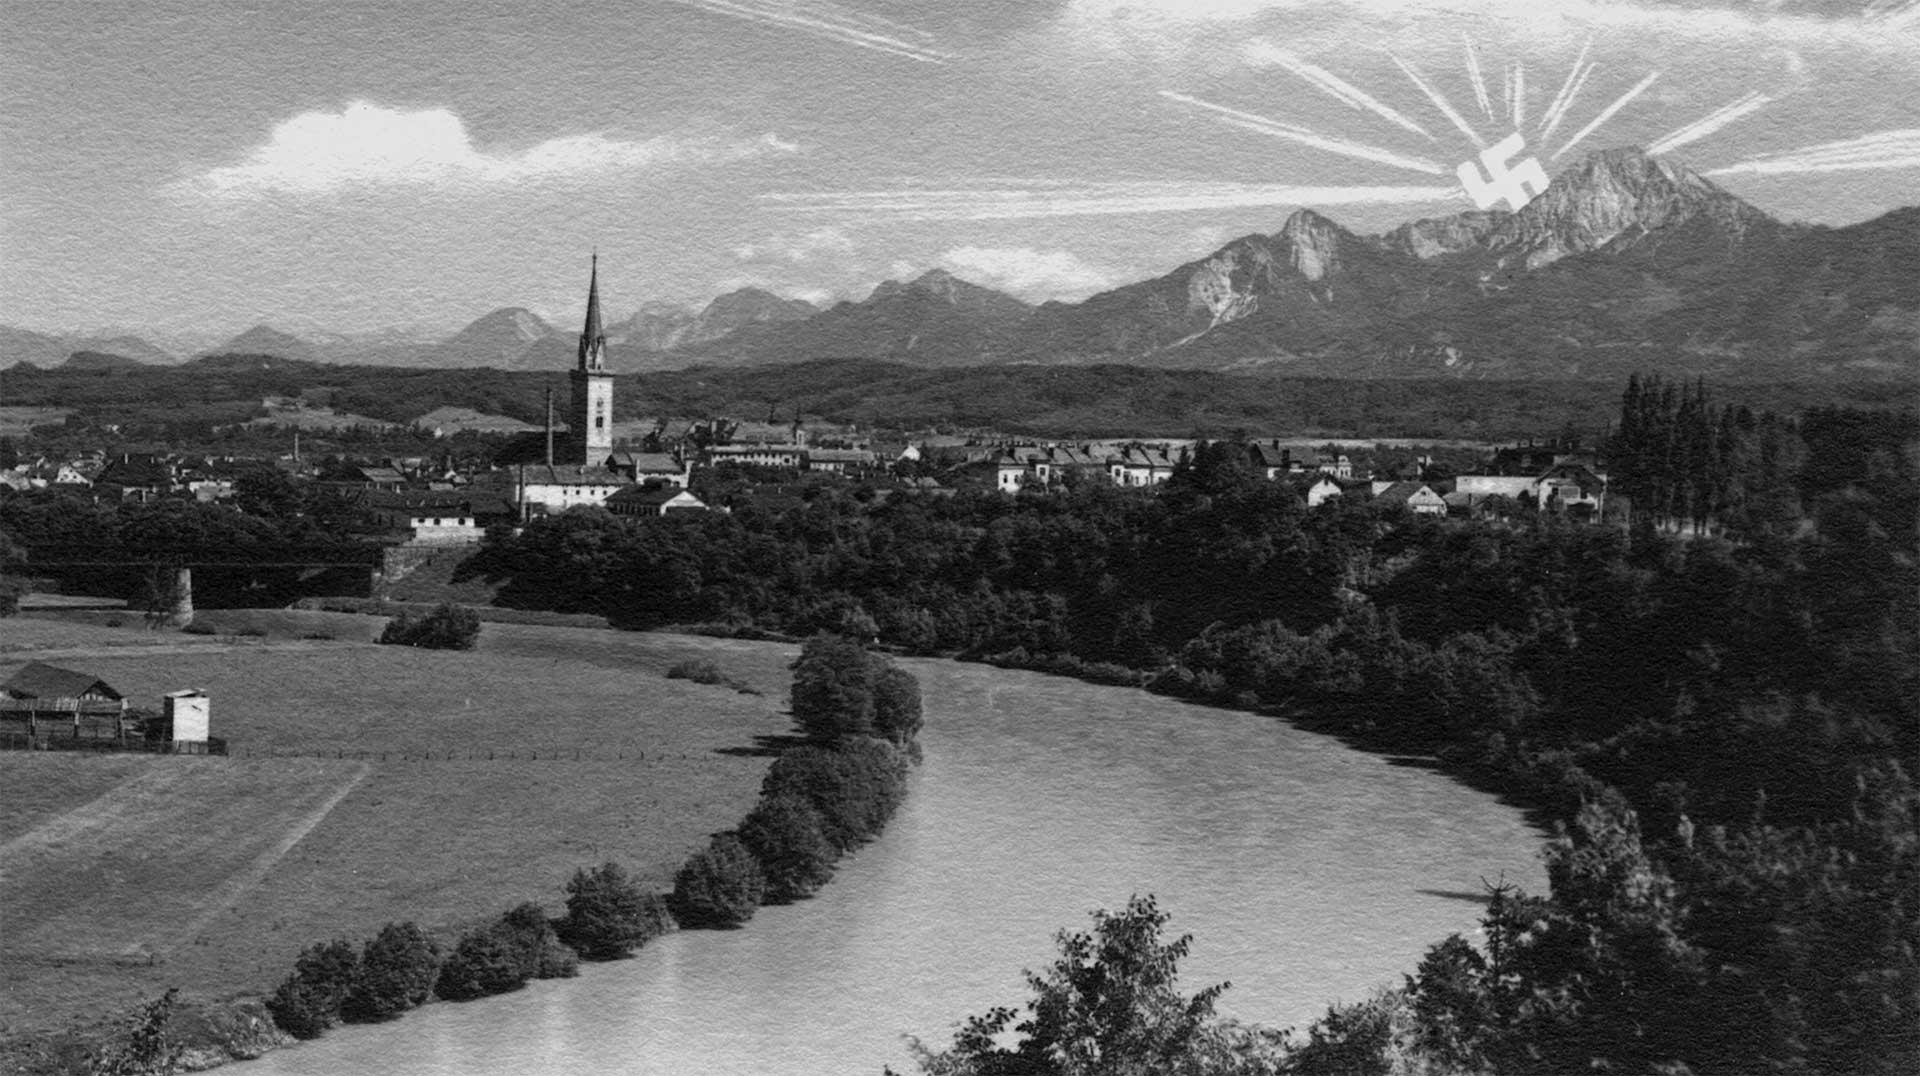 Kärnten (kaernten_05_villach_hk.jpg)